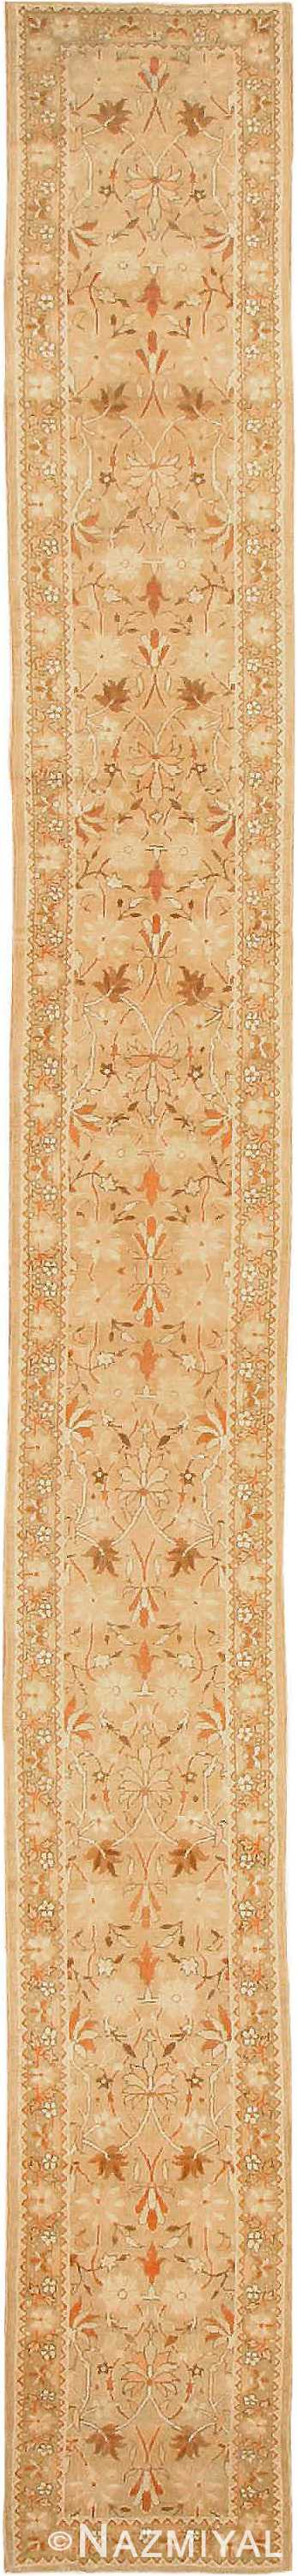 Antique Indian Amritsar Hallway Runner Rug #41971 by Nazmiyal Antique Rugs